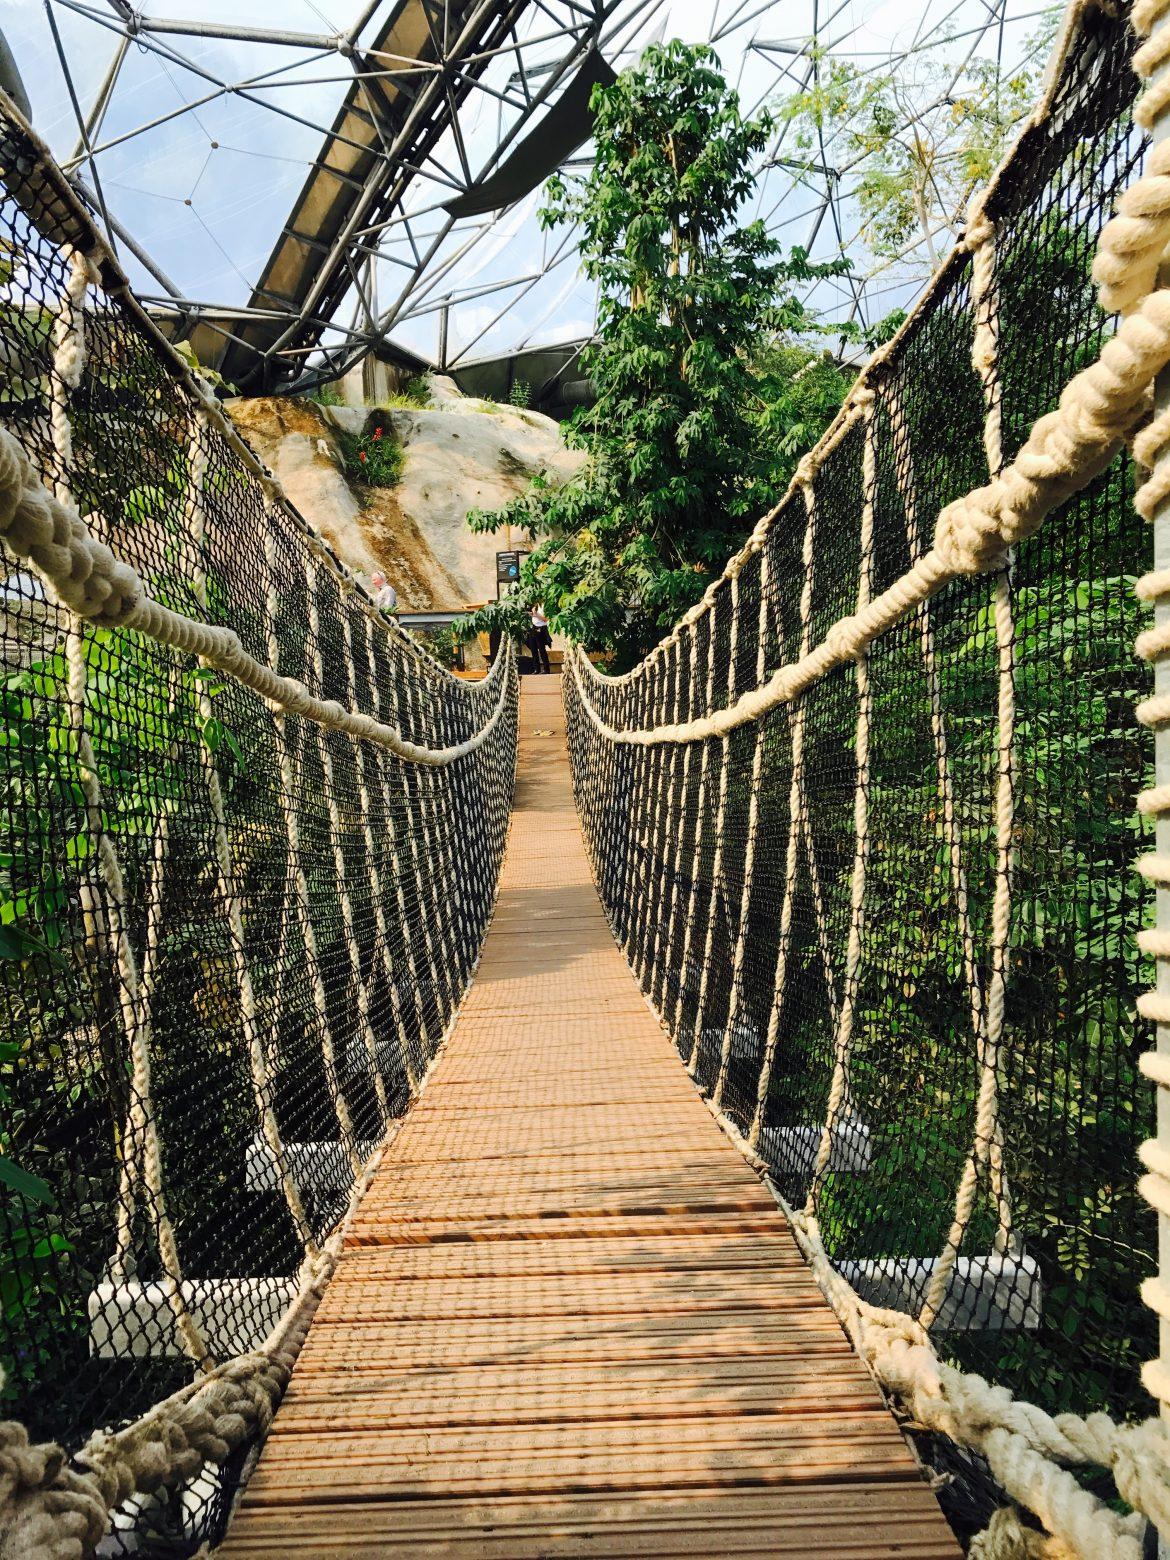 Rainforest biome canopy walk